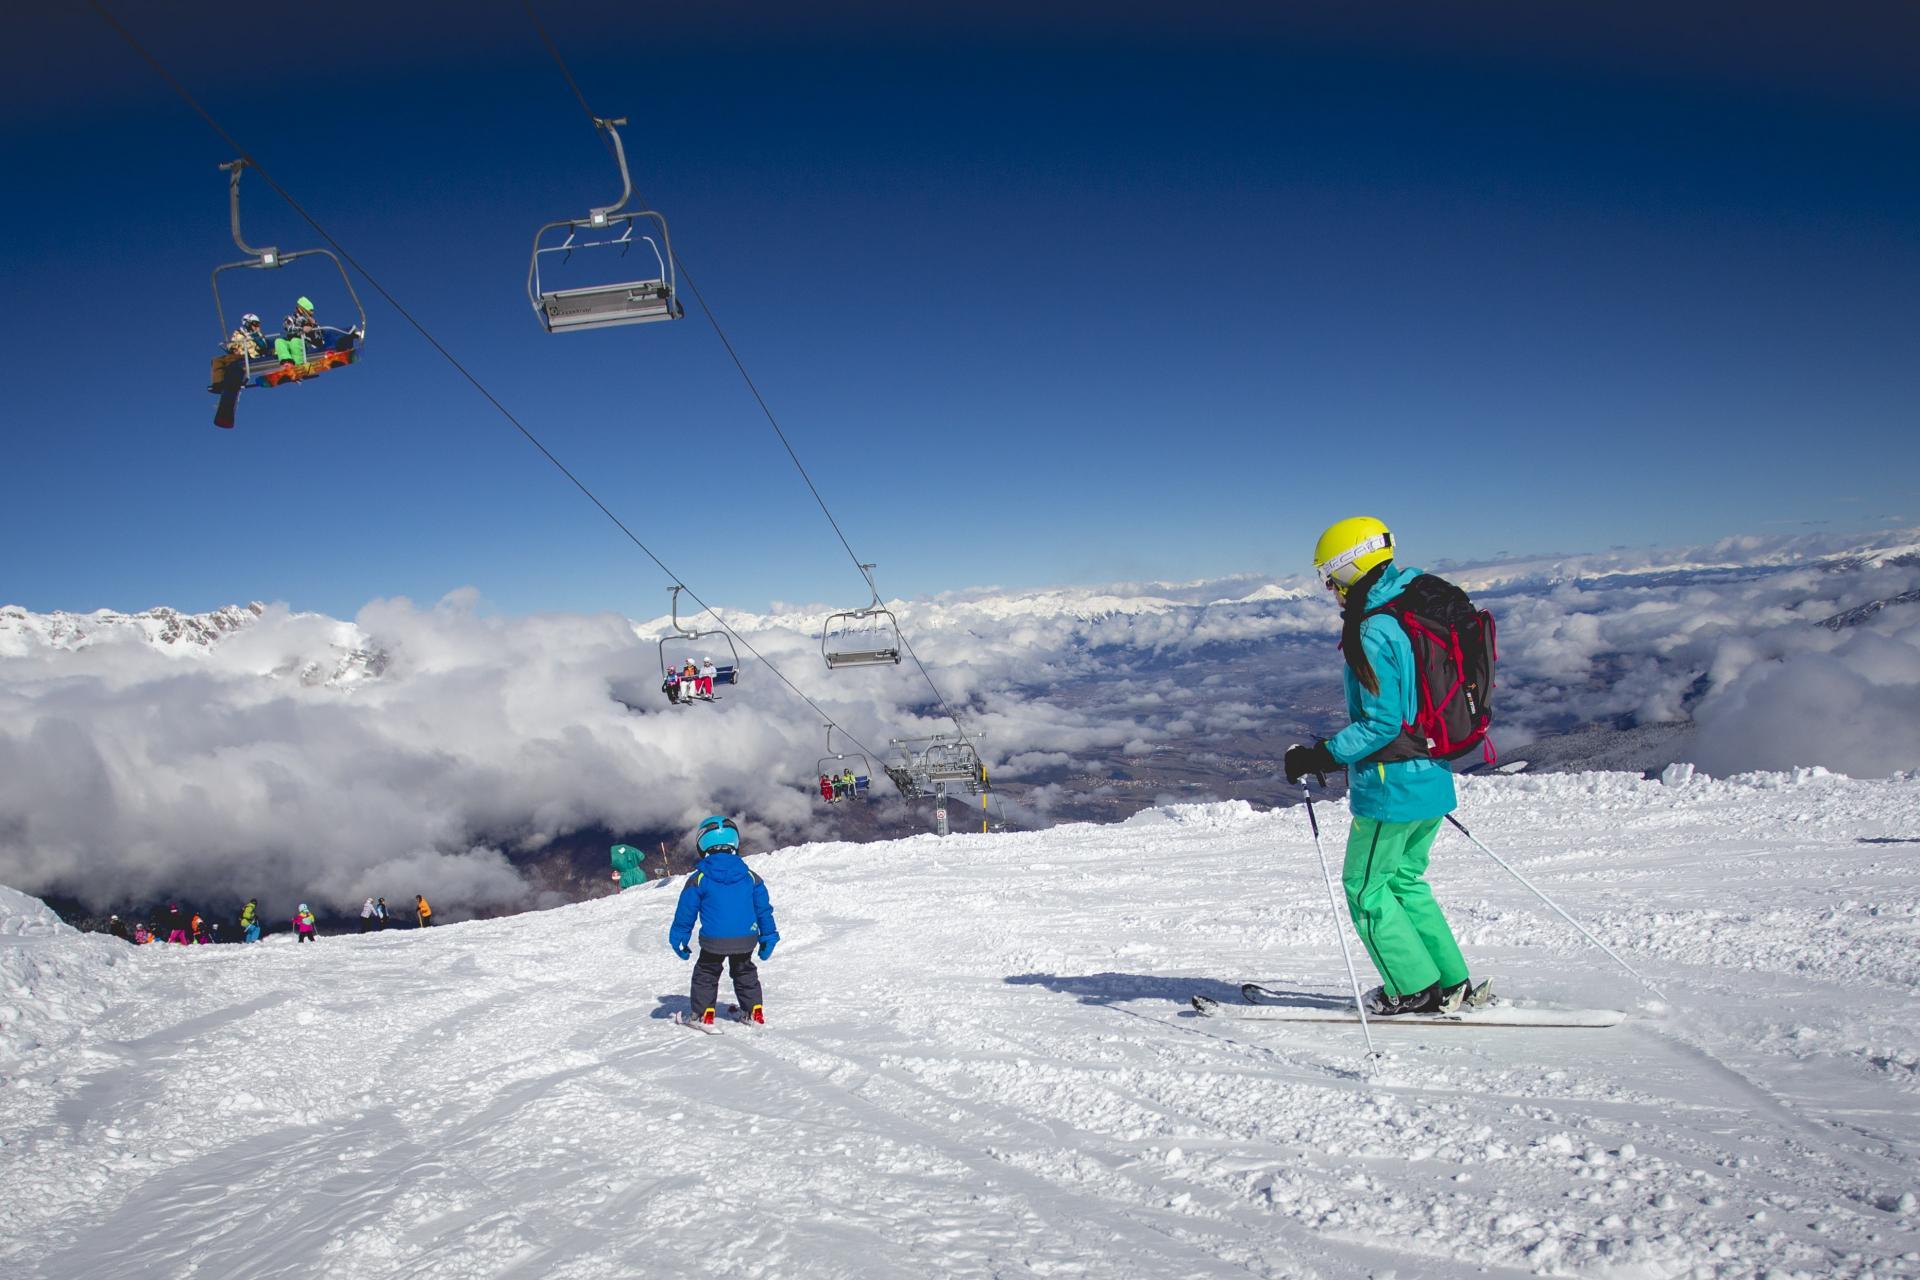 Educational ski camps